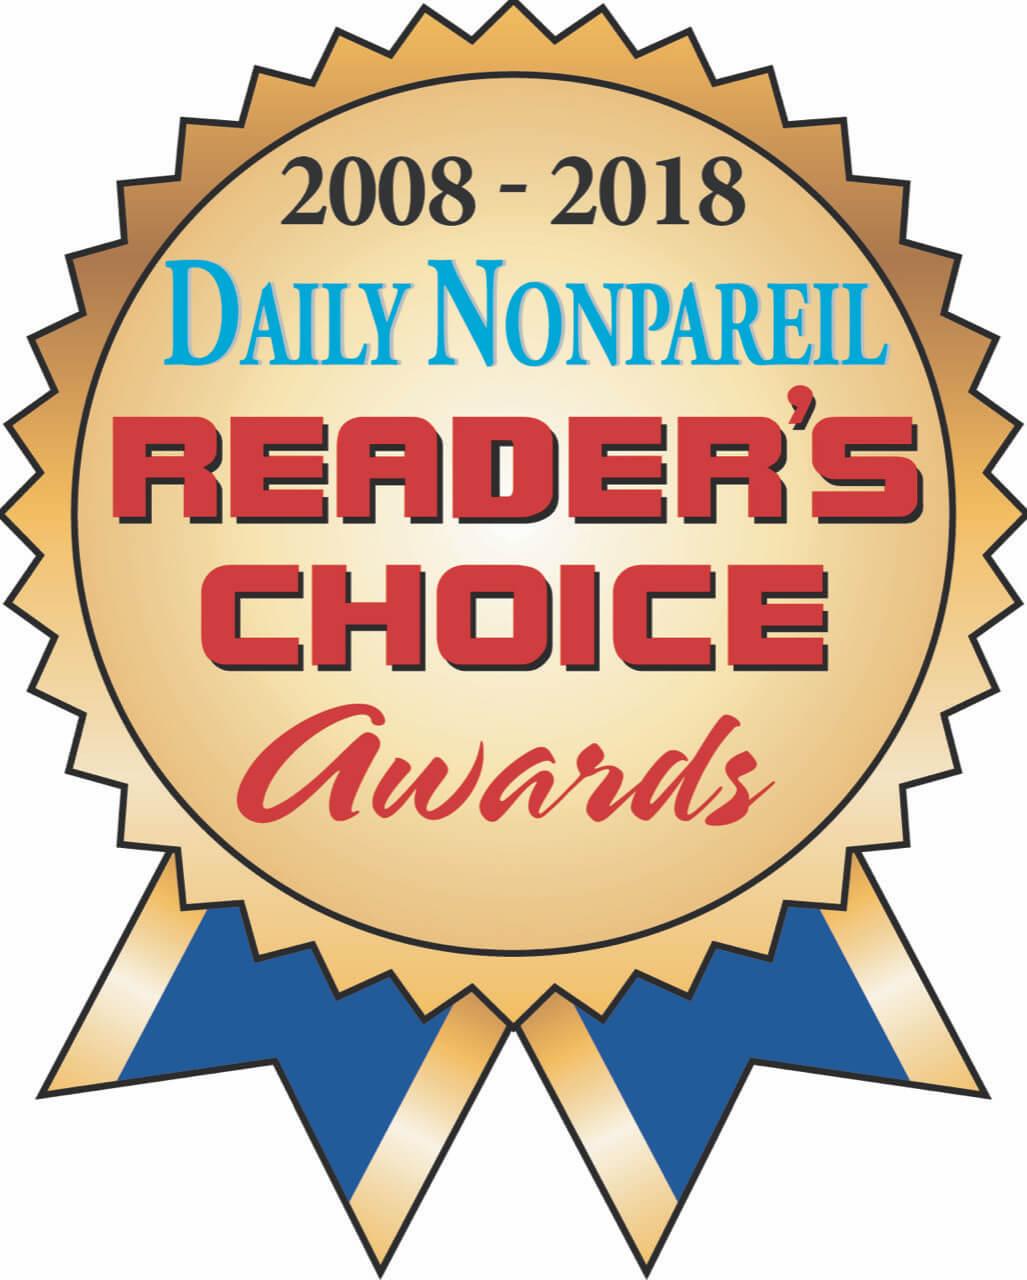 readers choice award 2008-2018(1)